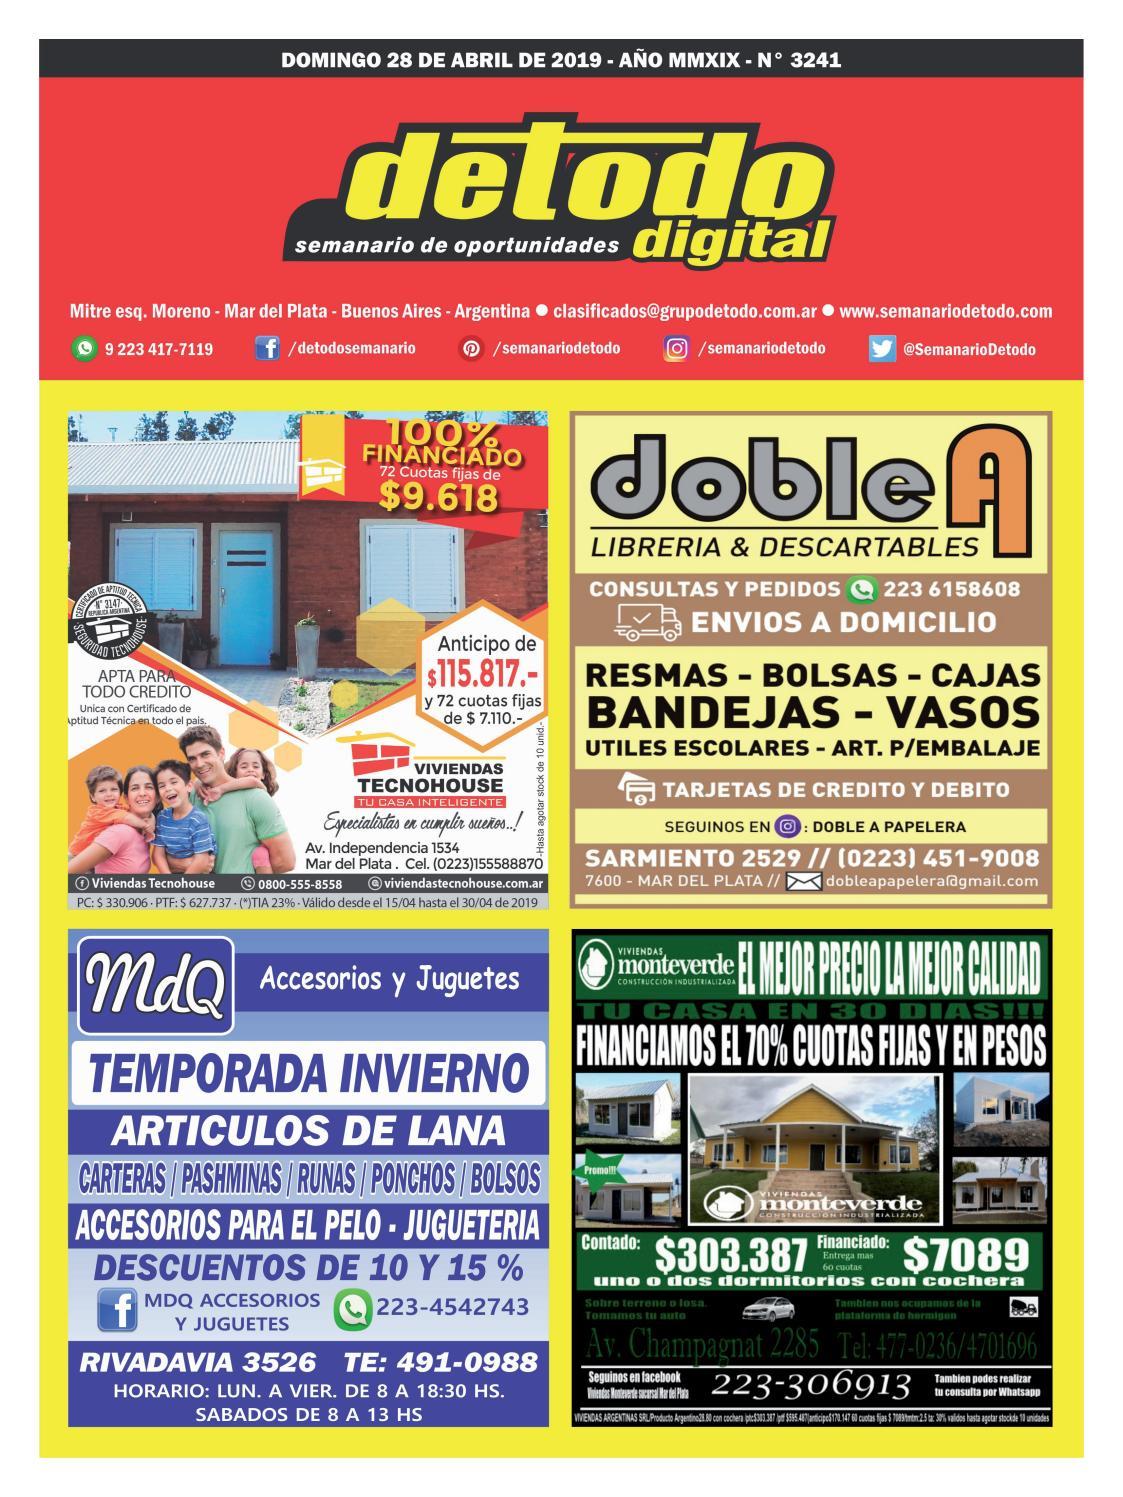 e8e1605ac Semanario Detodo - Edición N° 3241 - 28/04/2019 by Semanario Detodo - issuu